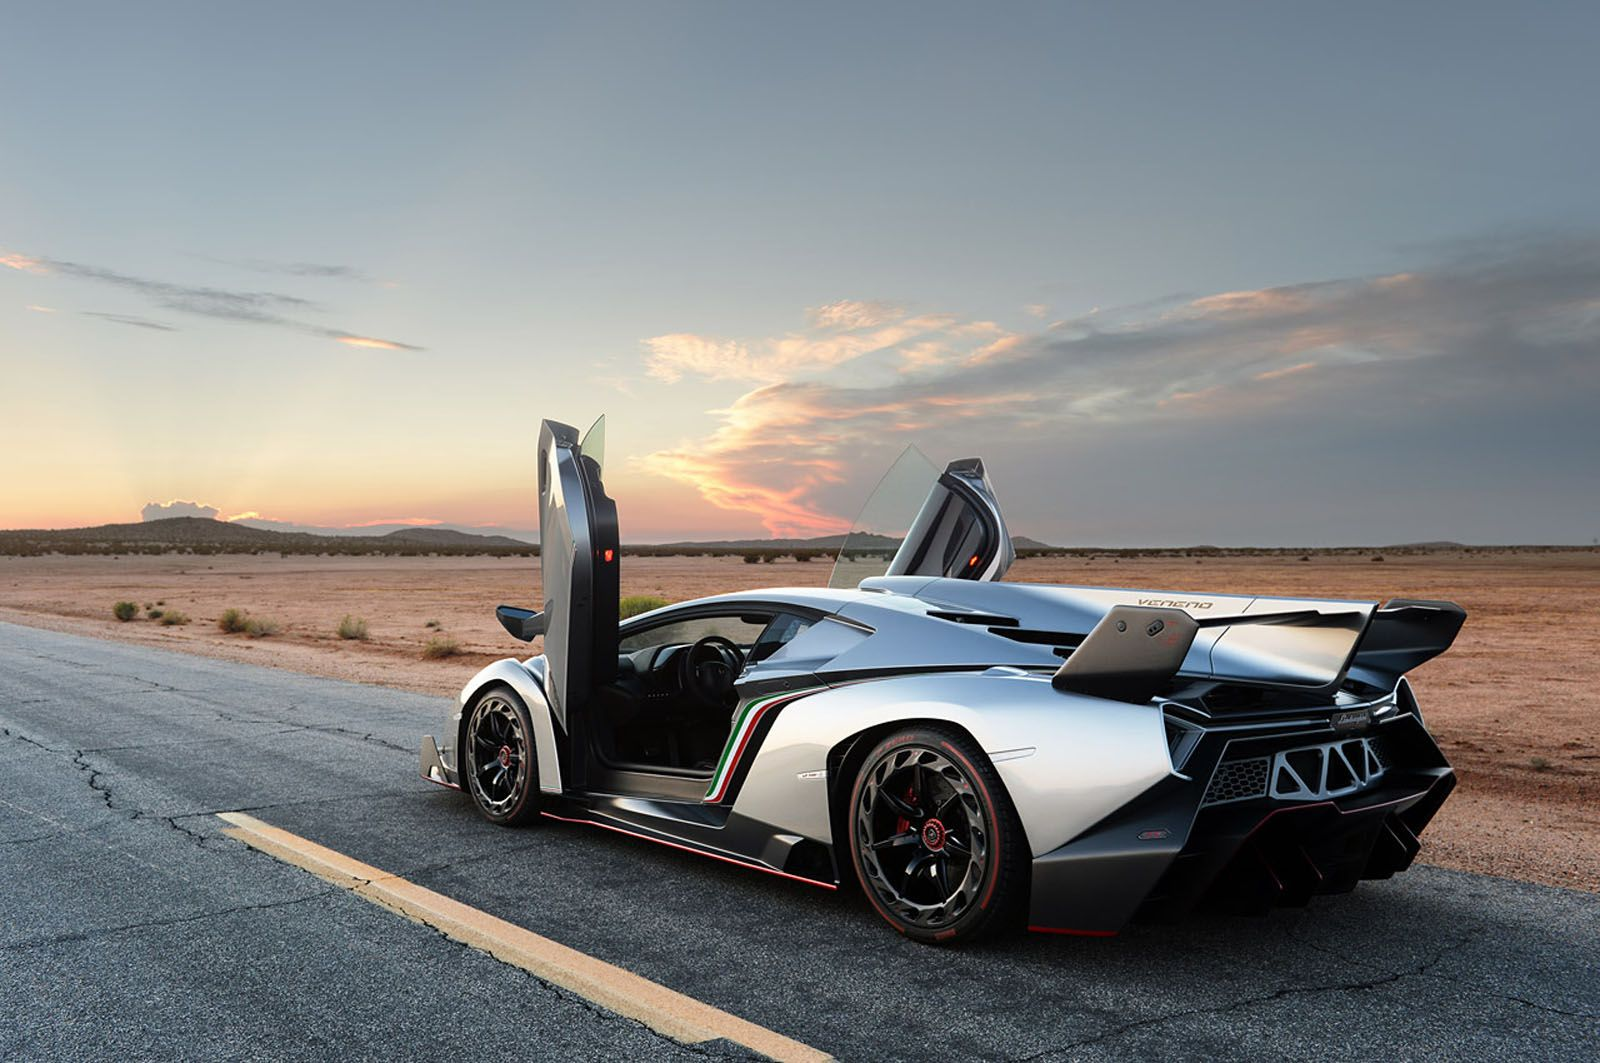 Lamborghini Veneno Doors Open (by SSsupersports)